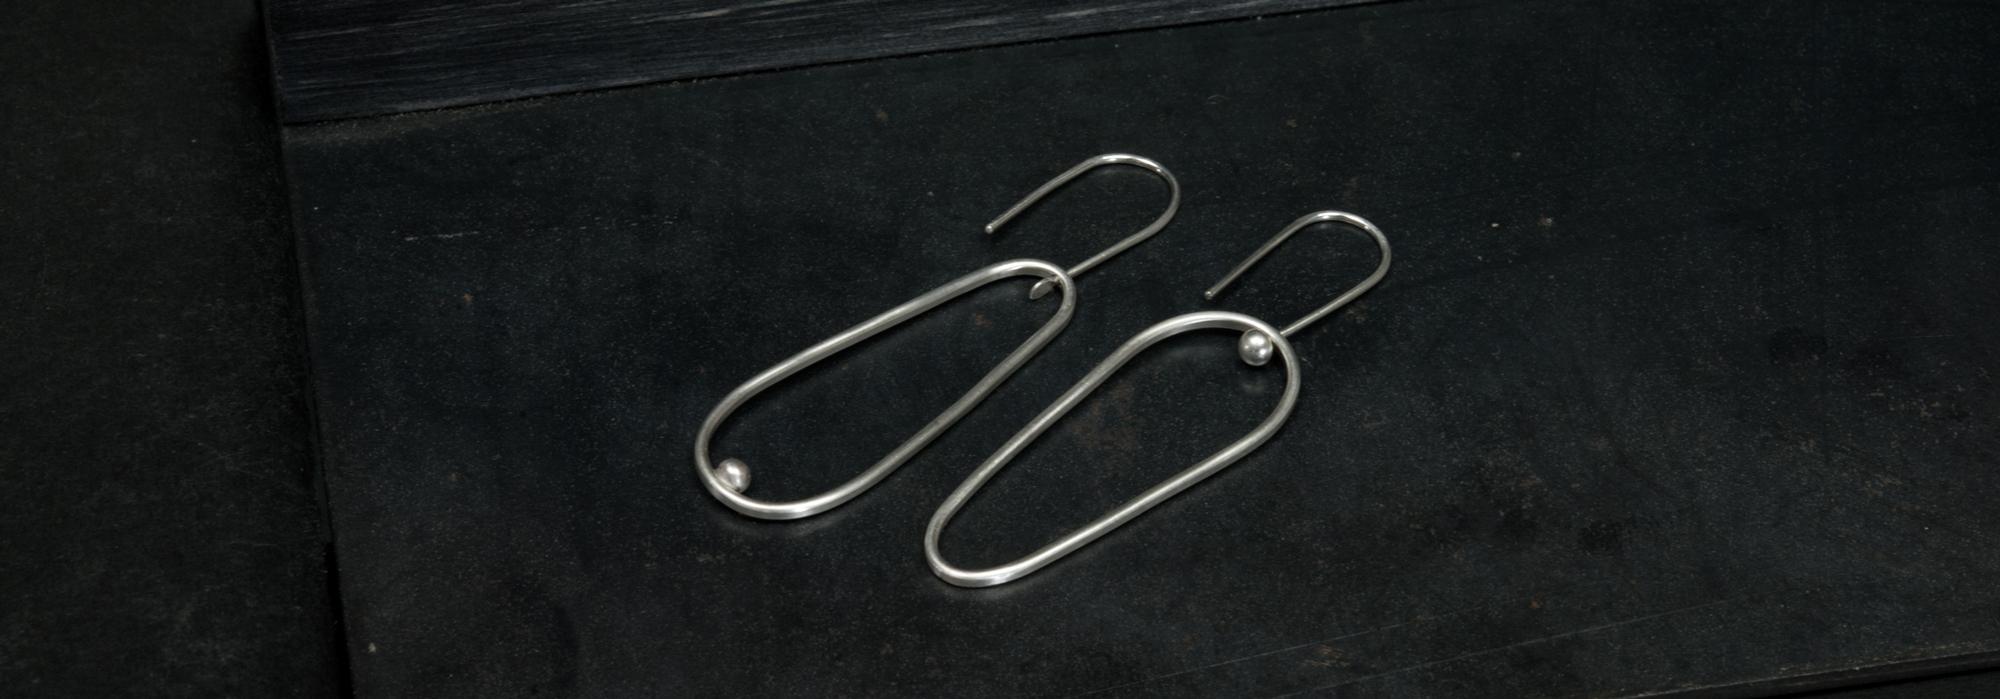 Rowena-Silk--Life-Balance-Earrings.jpg